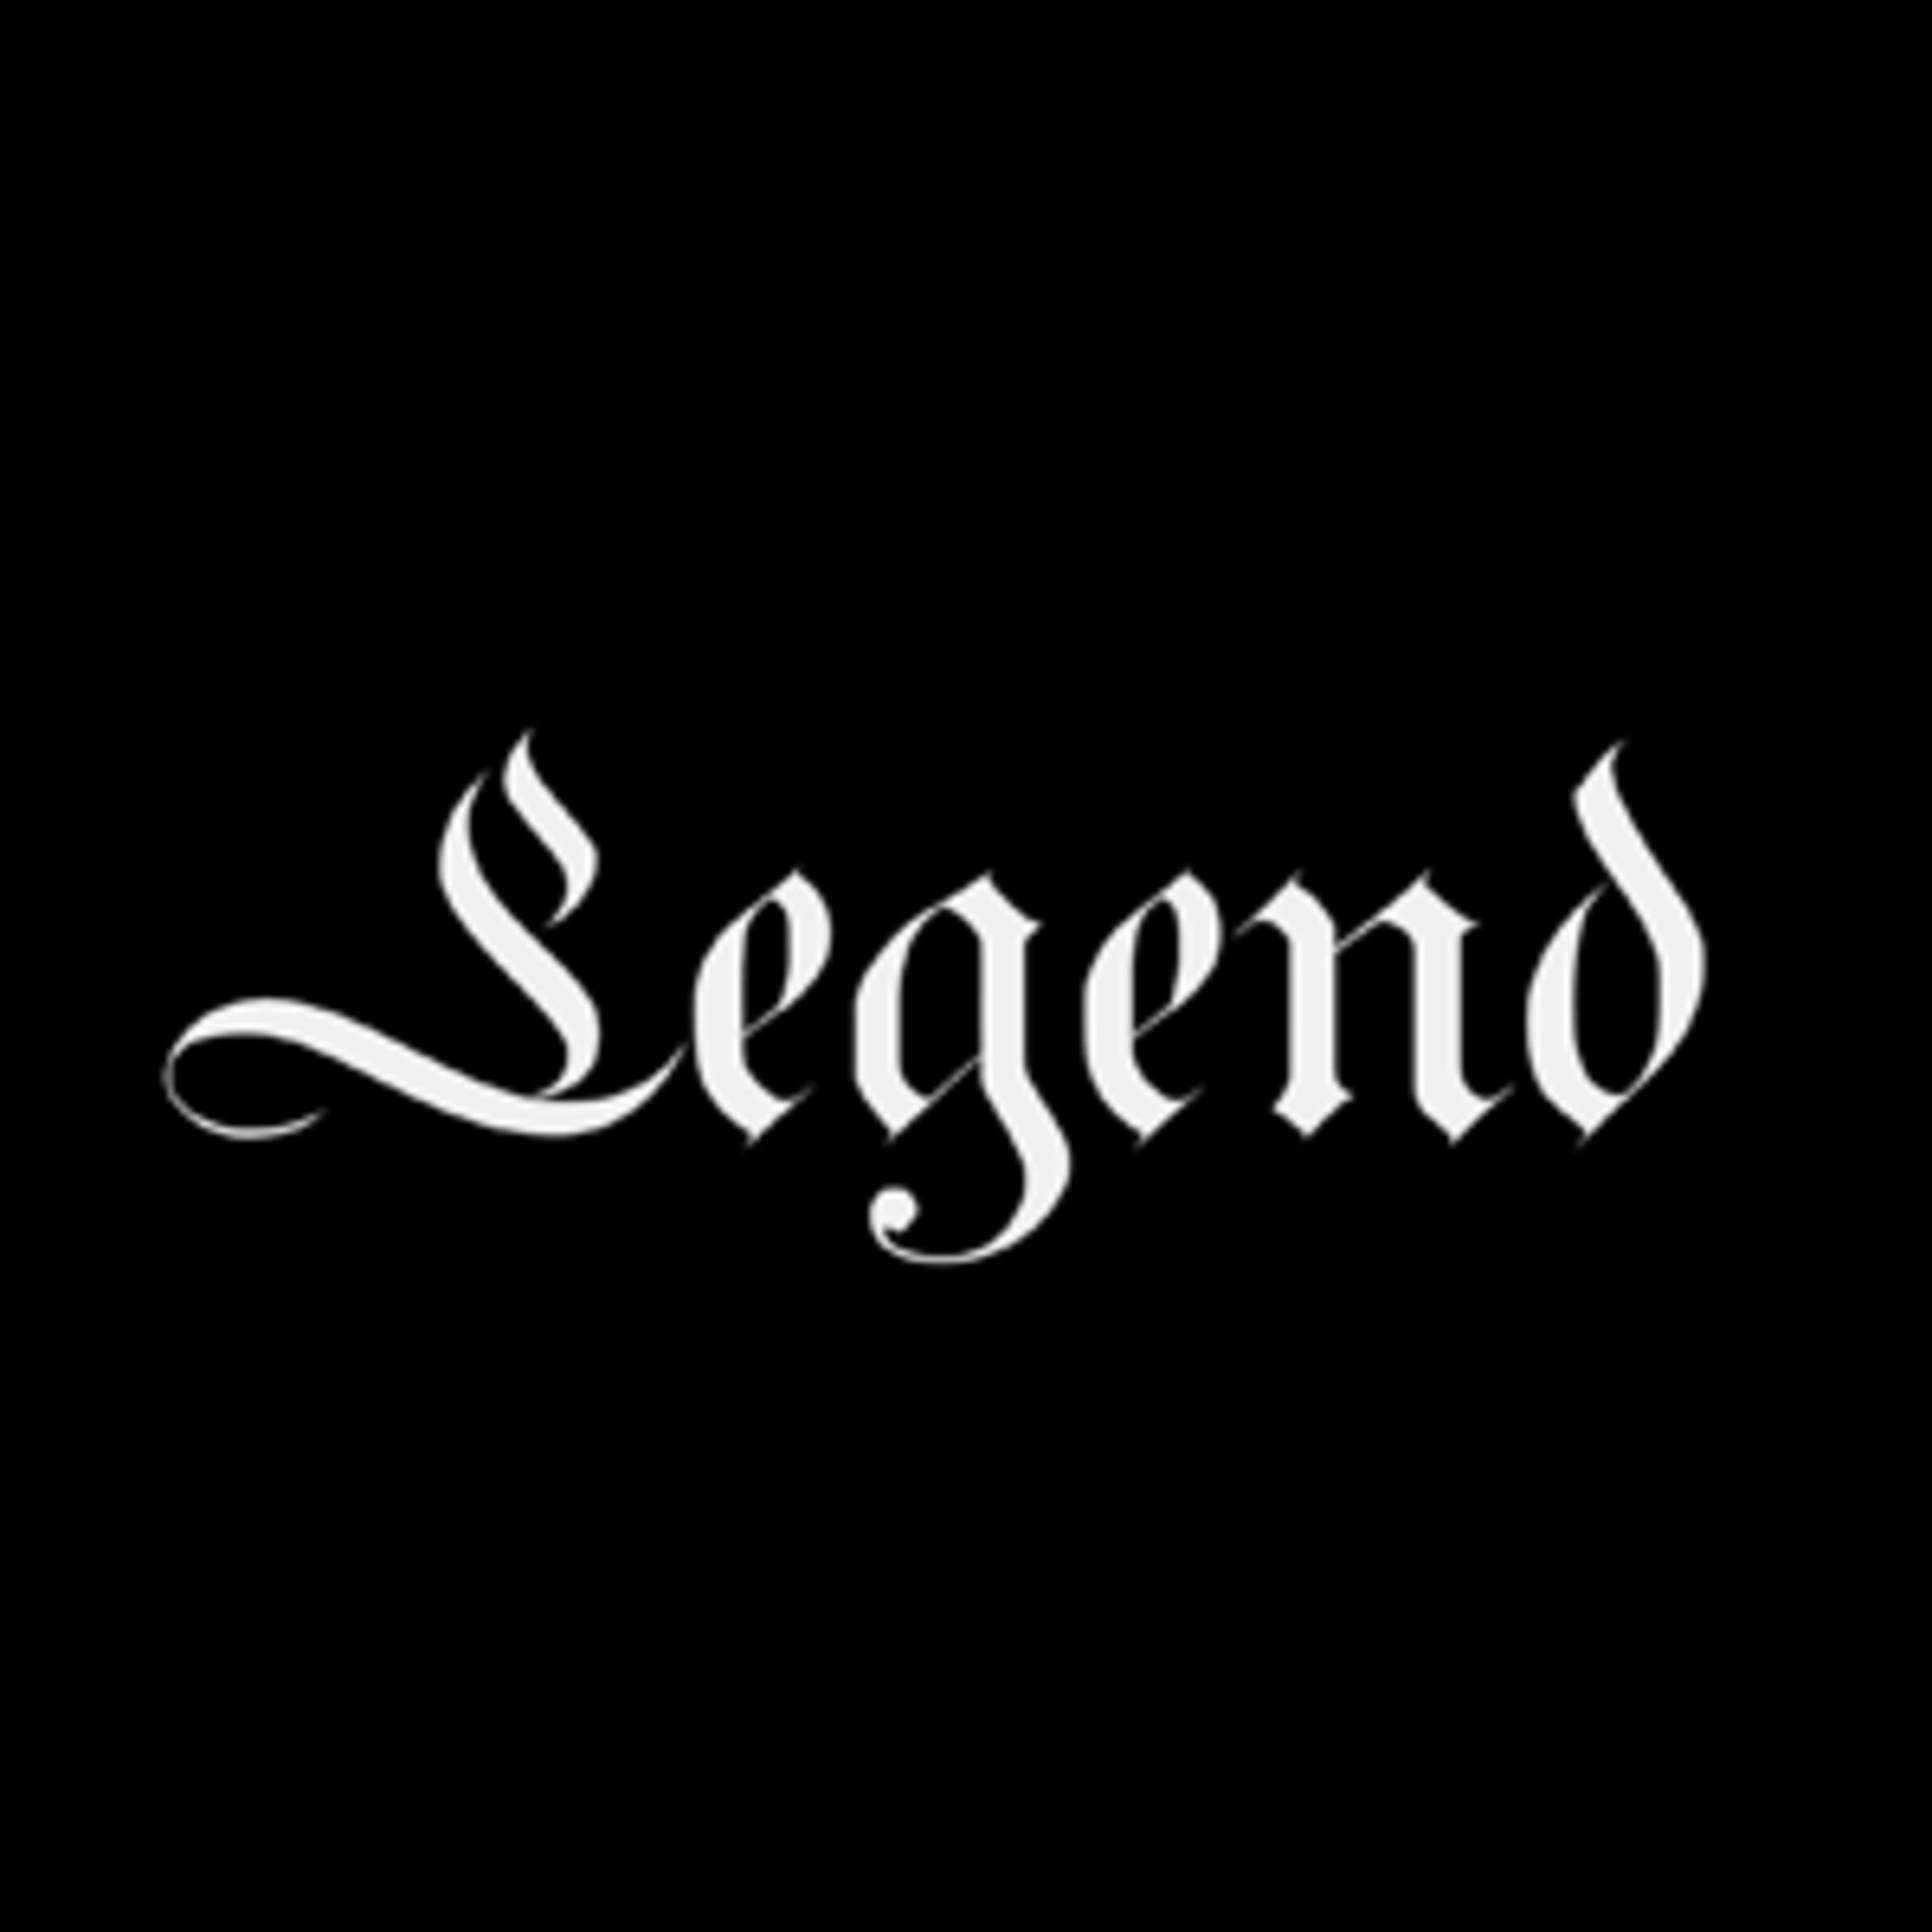 legend- company logo